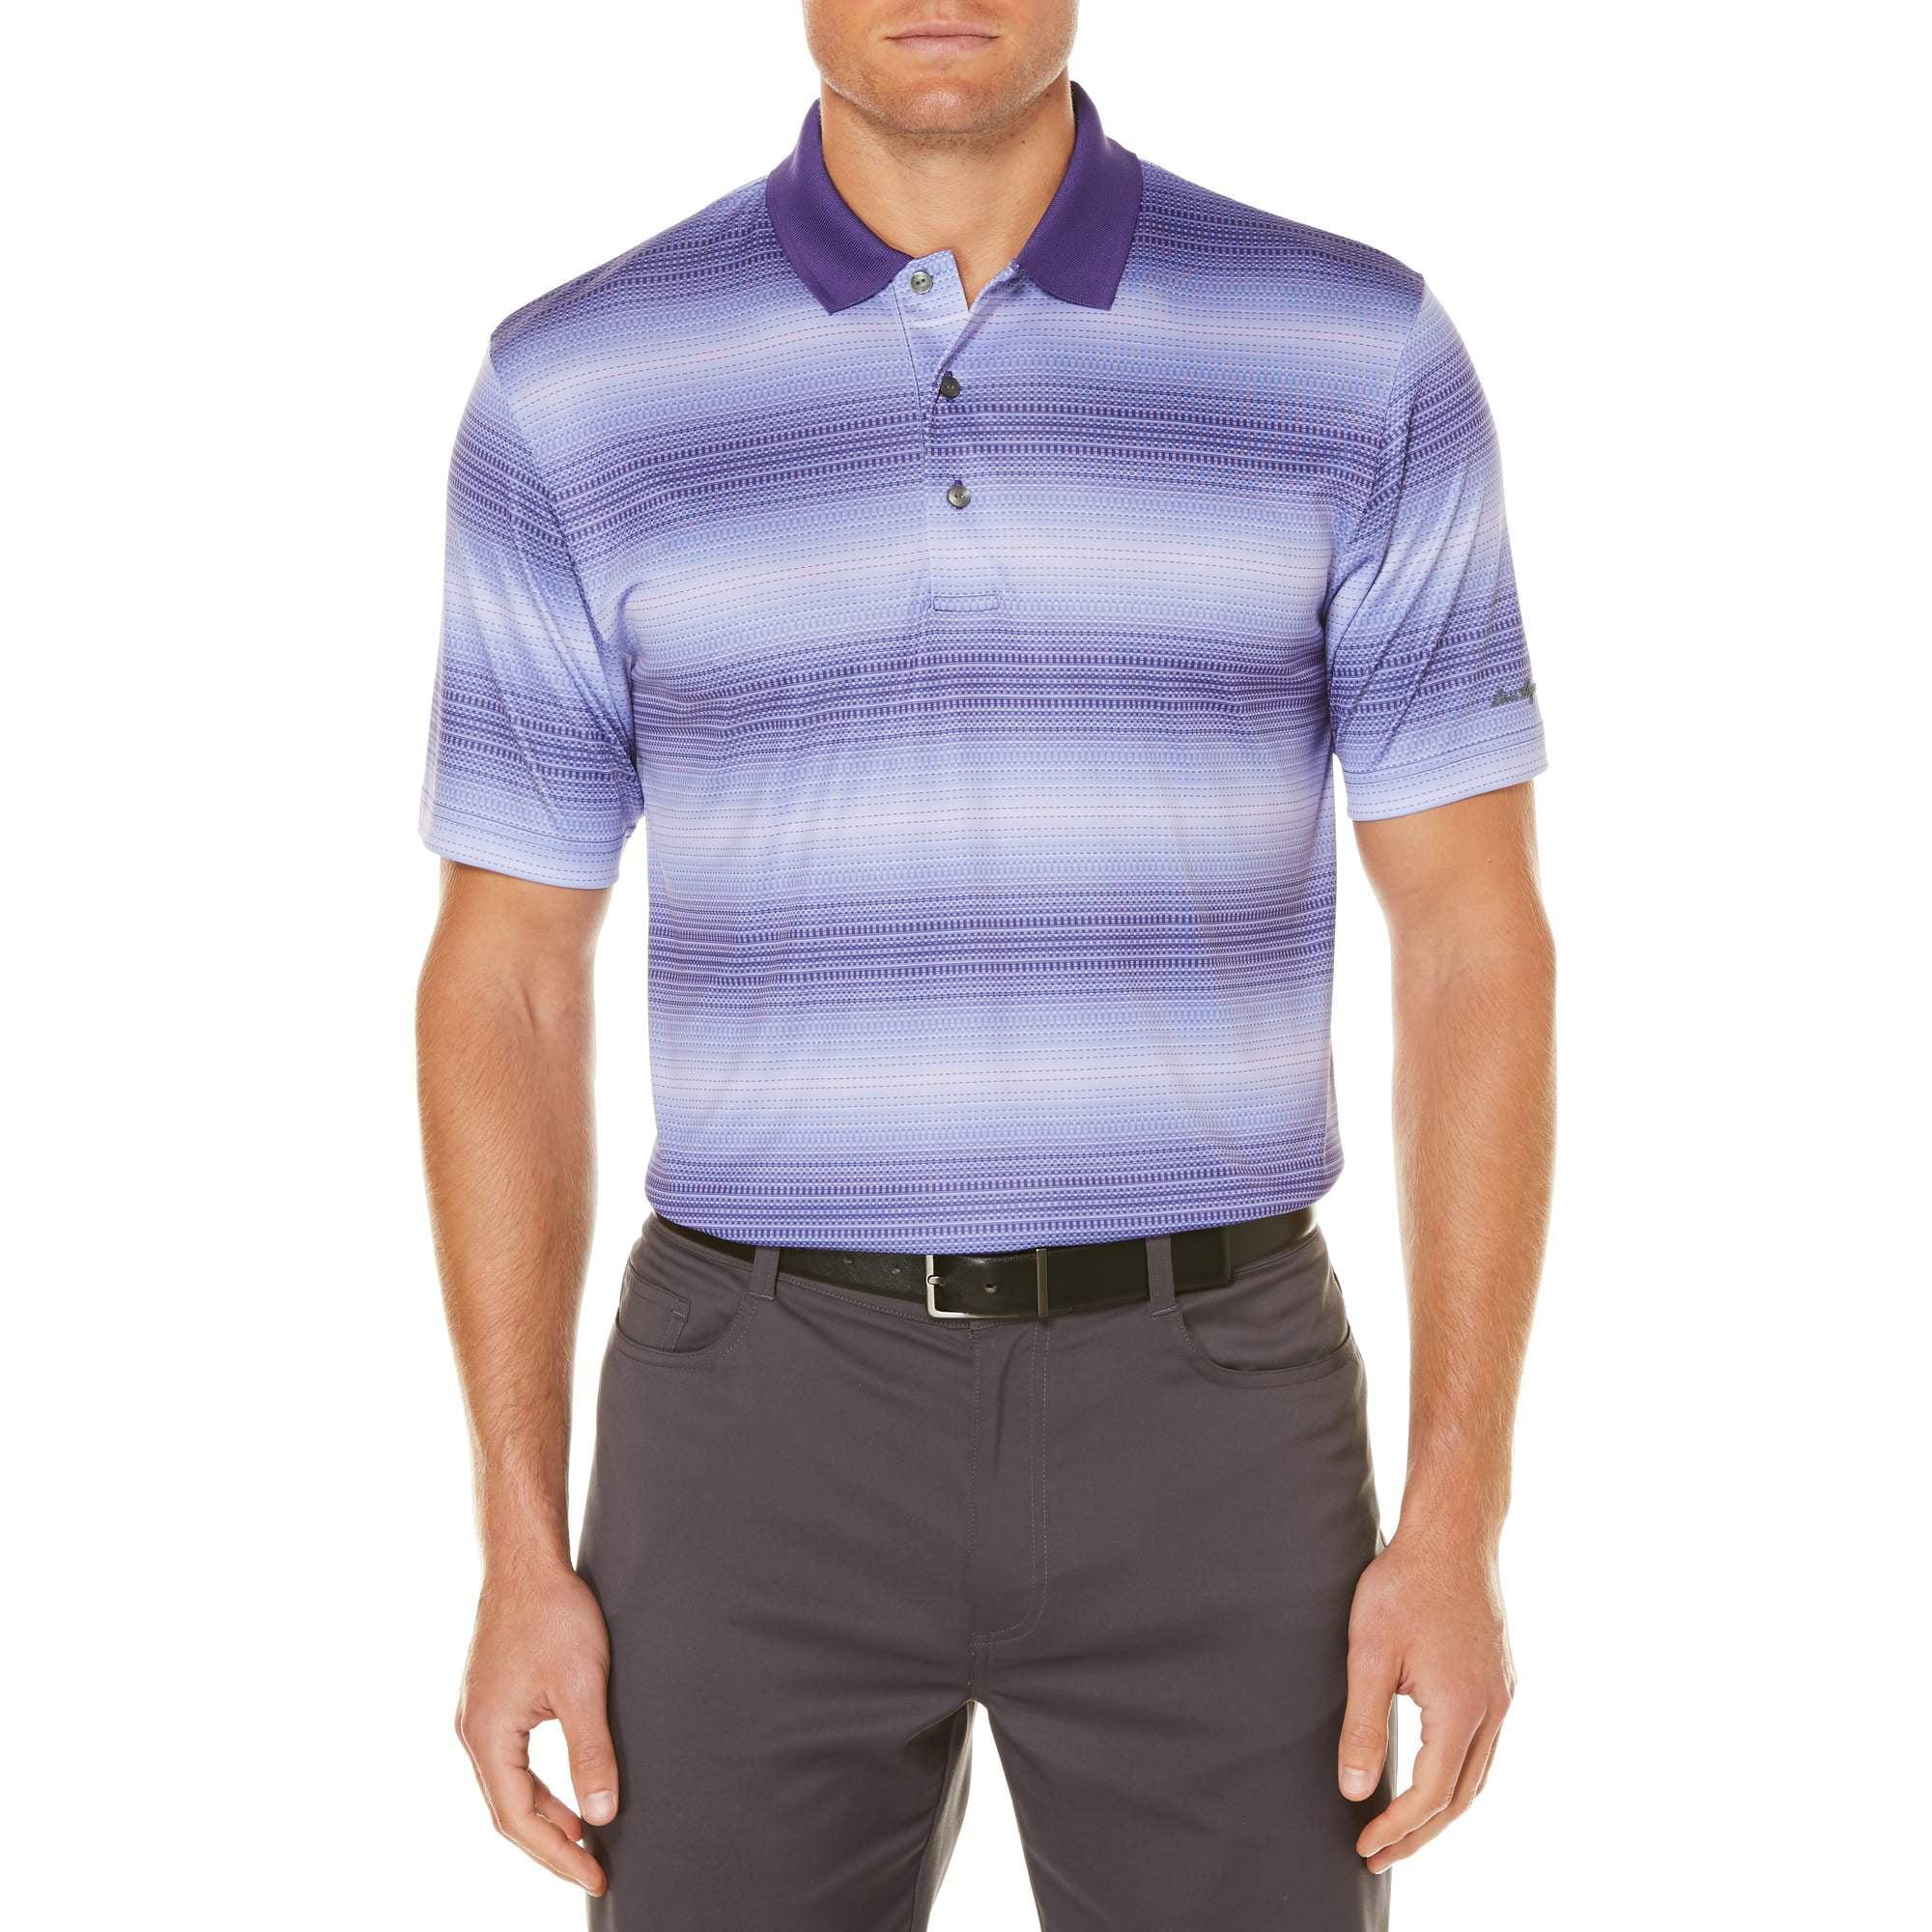 Men's Performance Short Sleeve Tonal Stripe Golf Polo Shirt